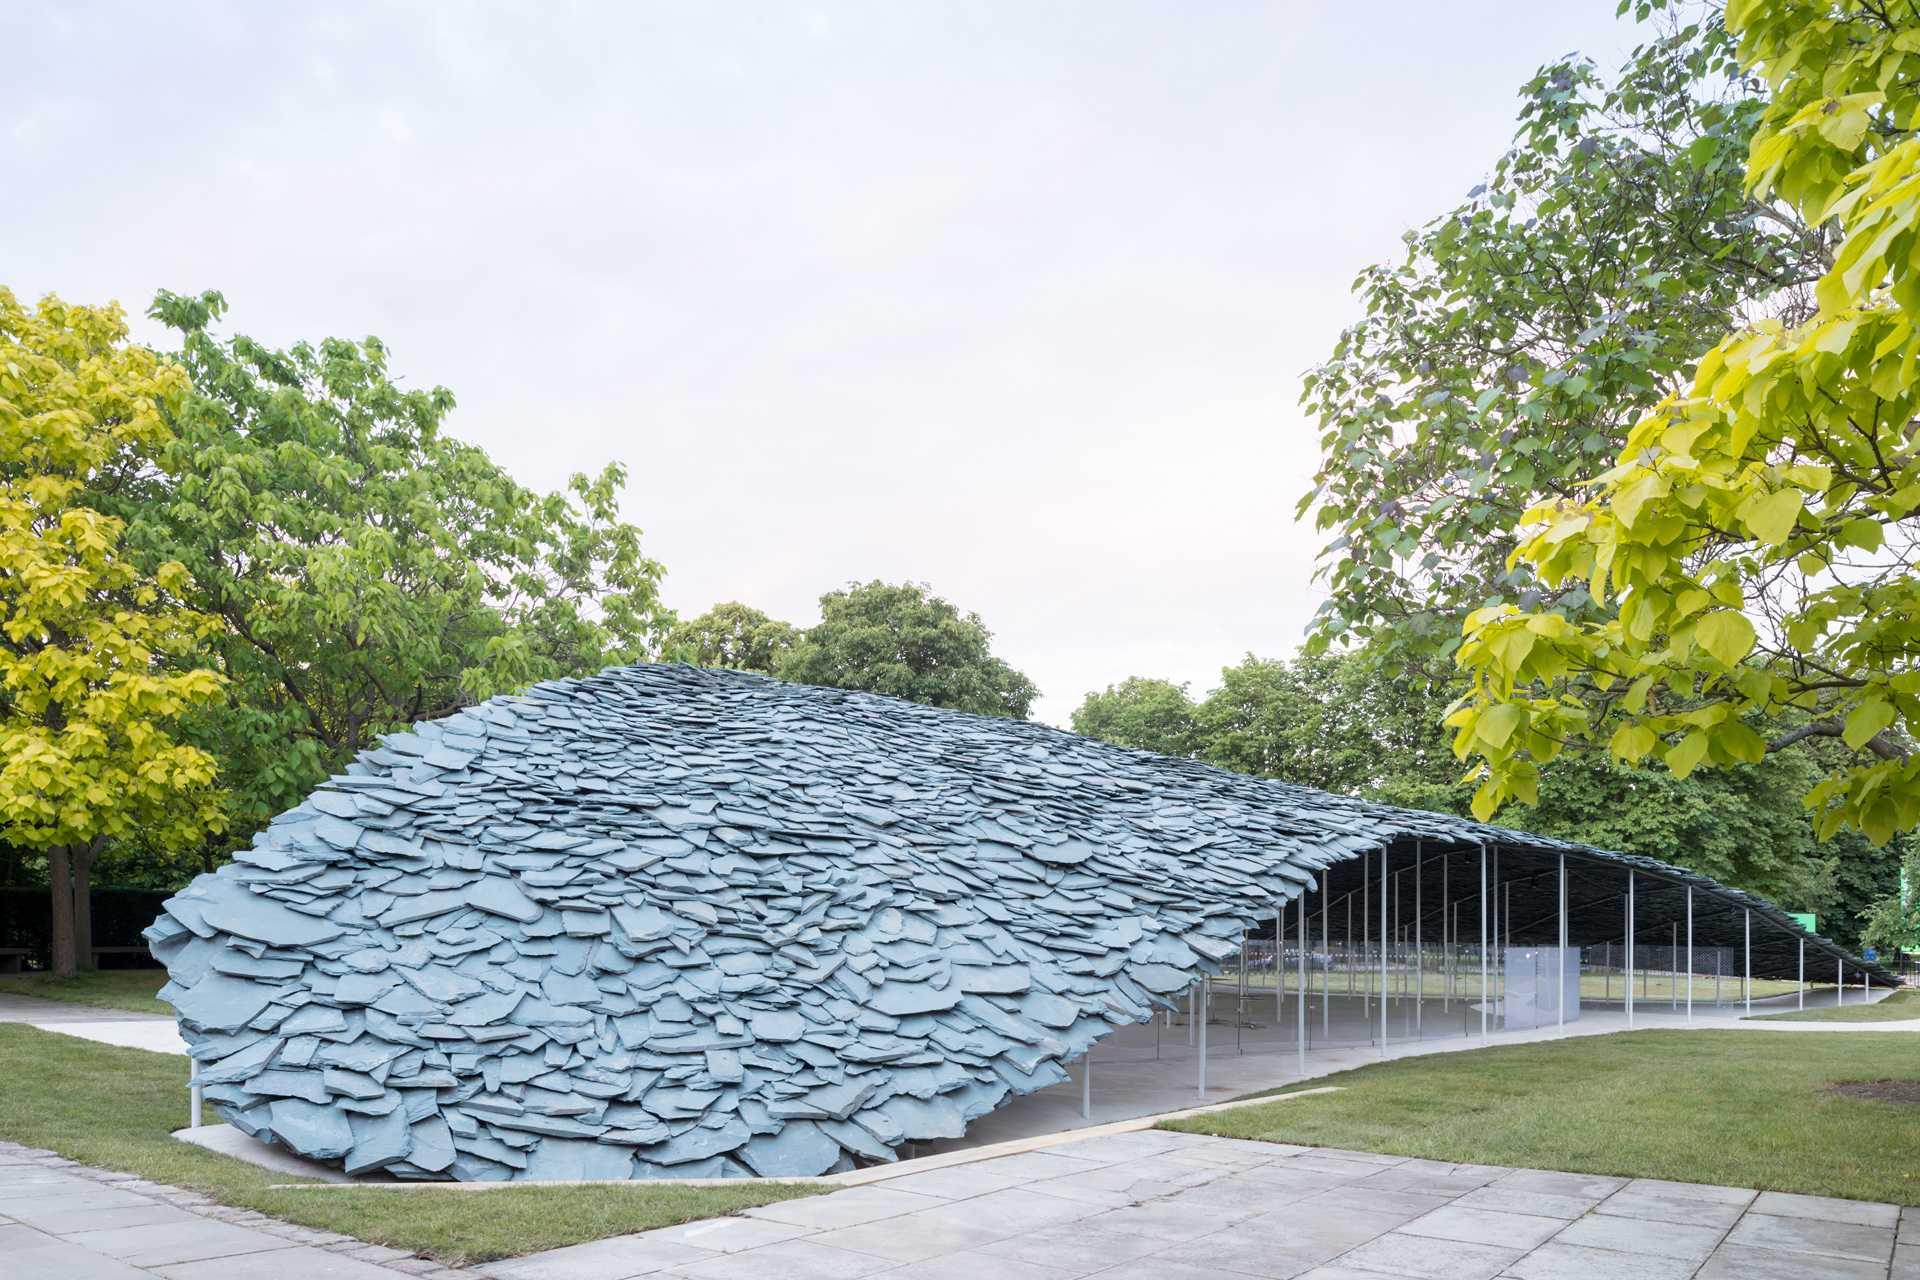 Serpentine Pavilion 2019  - 02 Iwan Baan 5 32